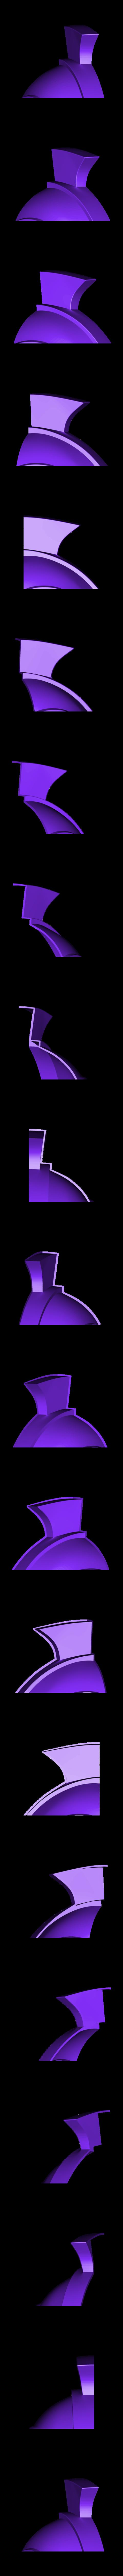 Part_2_v2.stl Download free STL file Senate Guard Helmet (Star Wars) • 3D printer design, VillainousPropShop